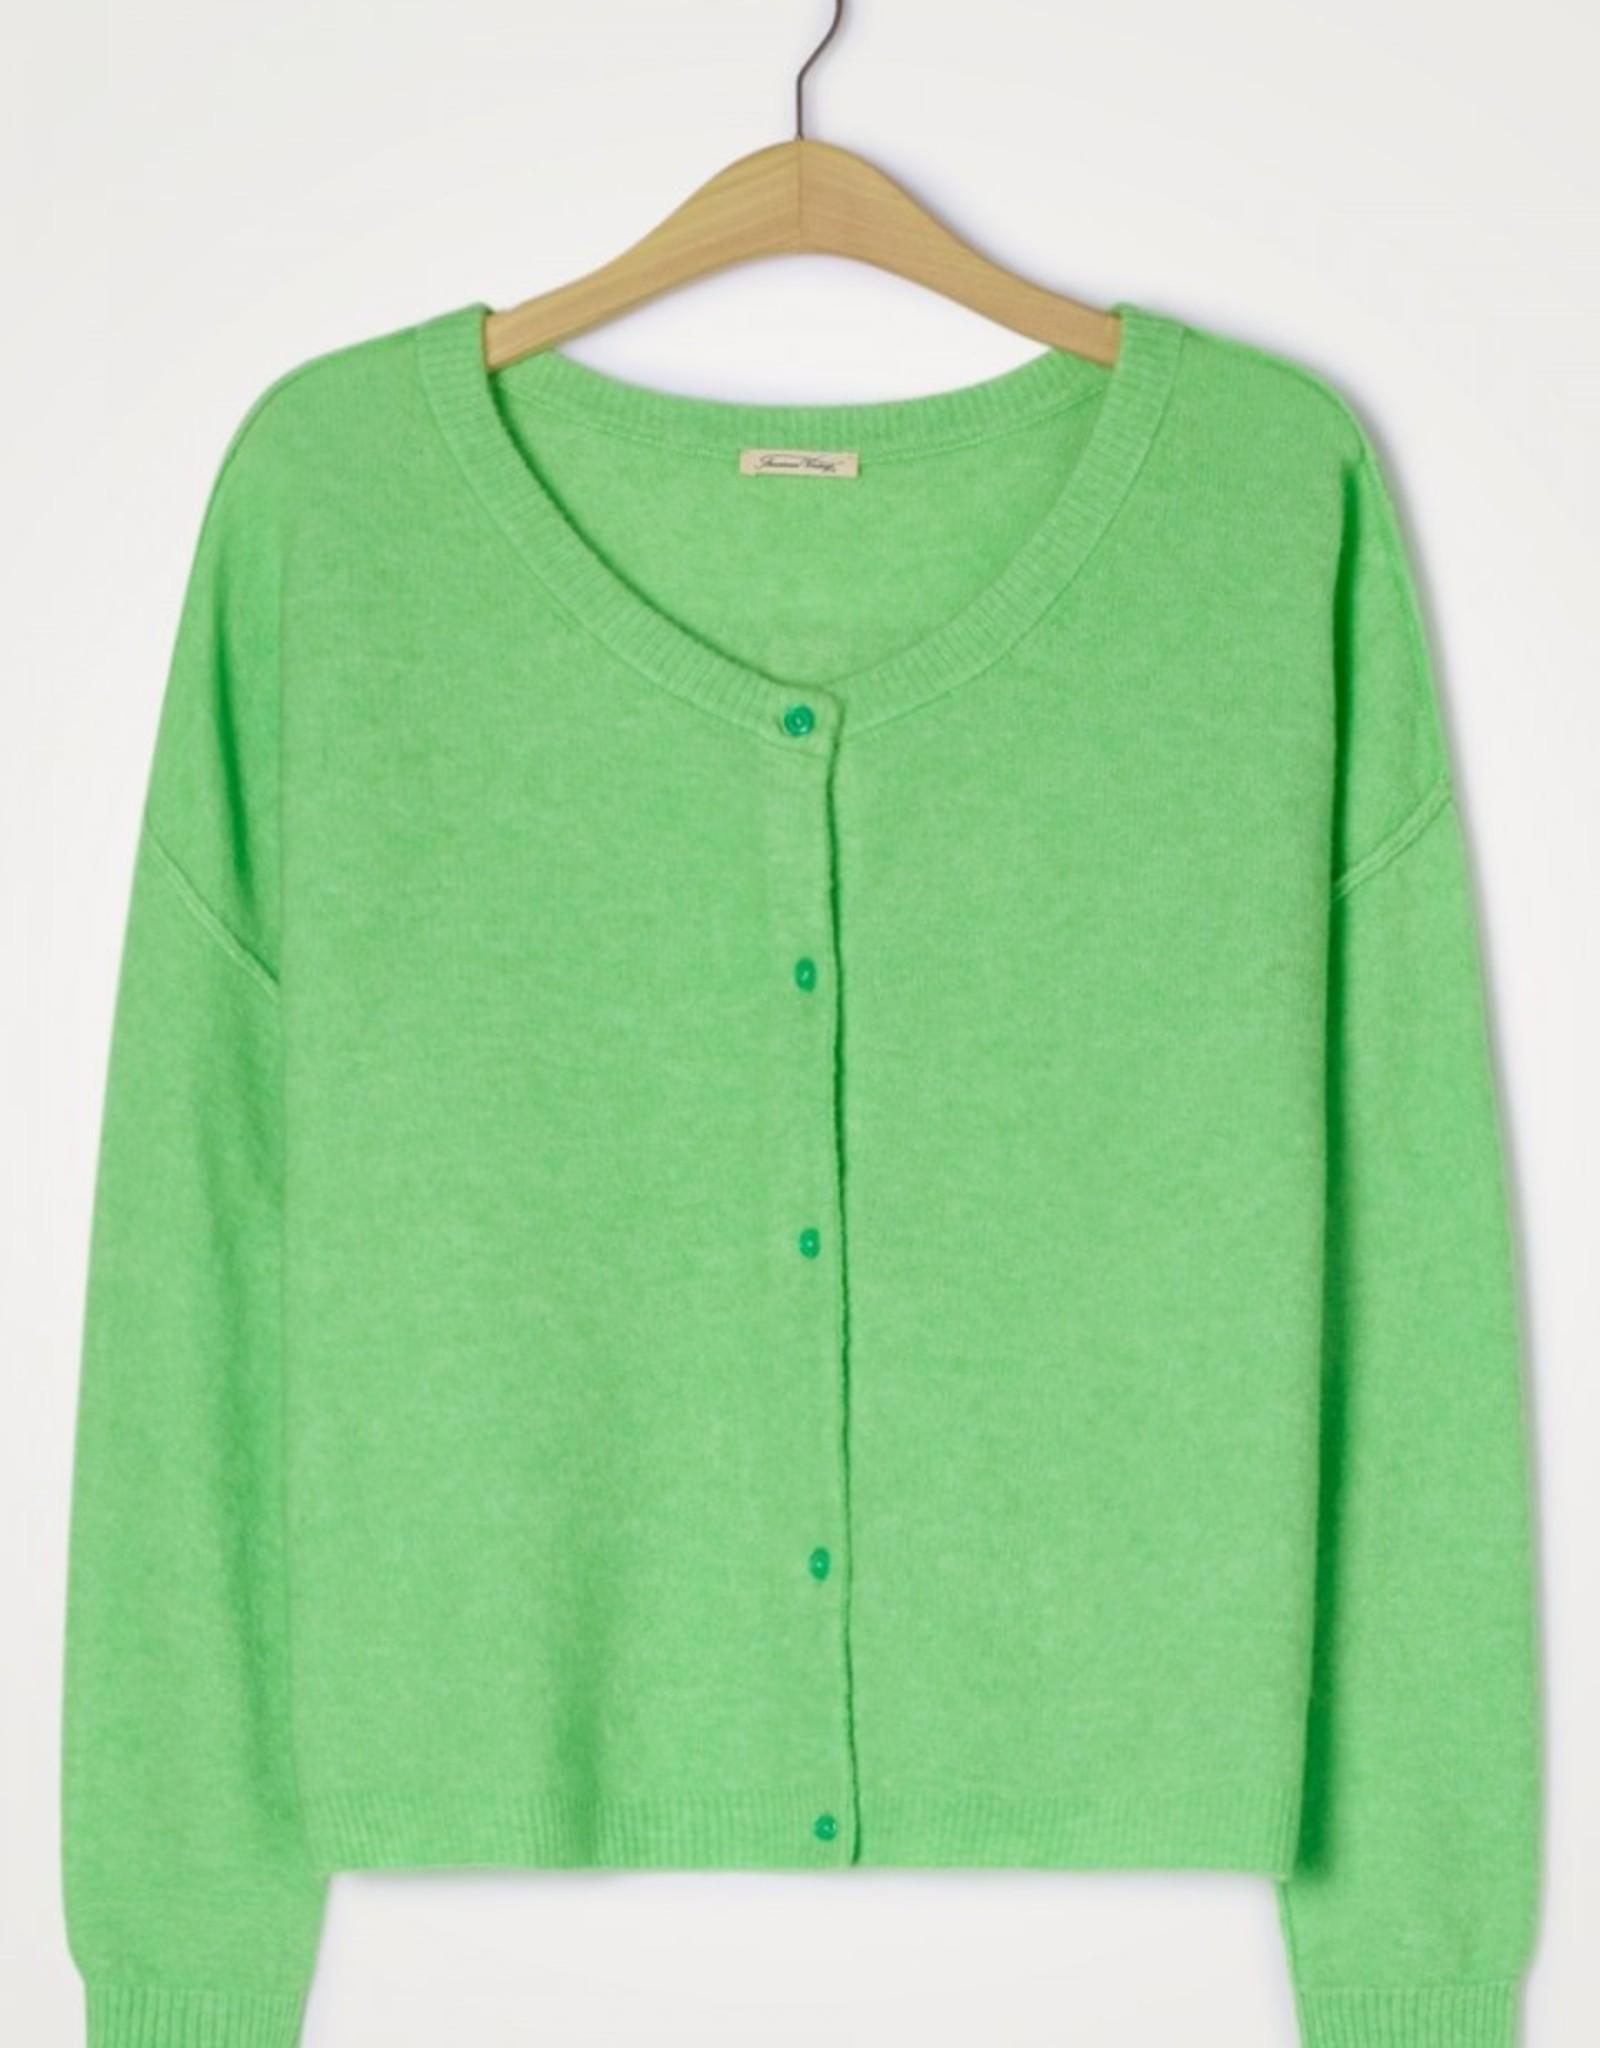 Vani Sweater